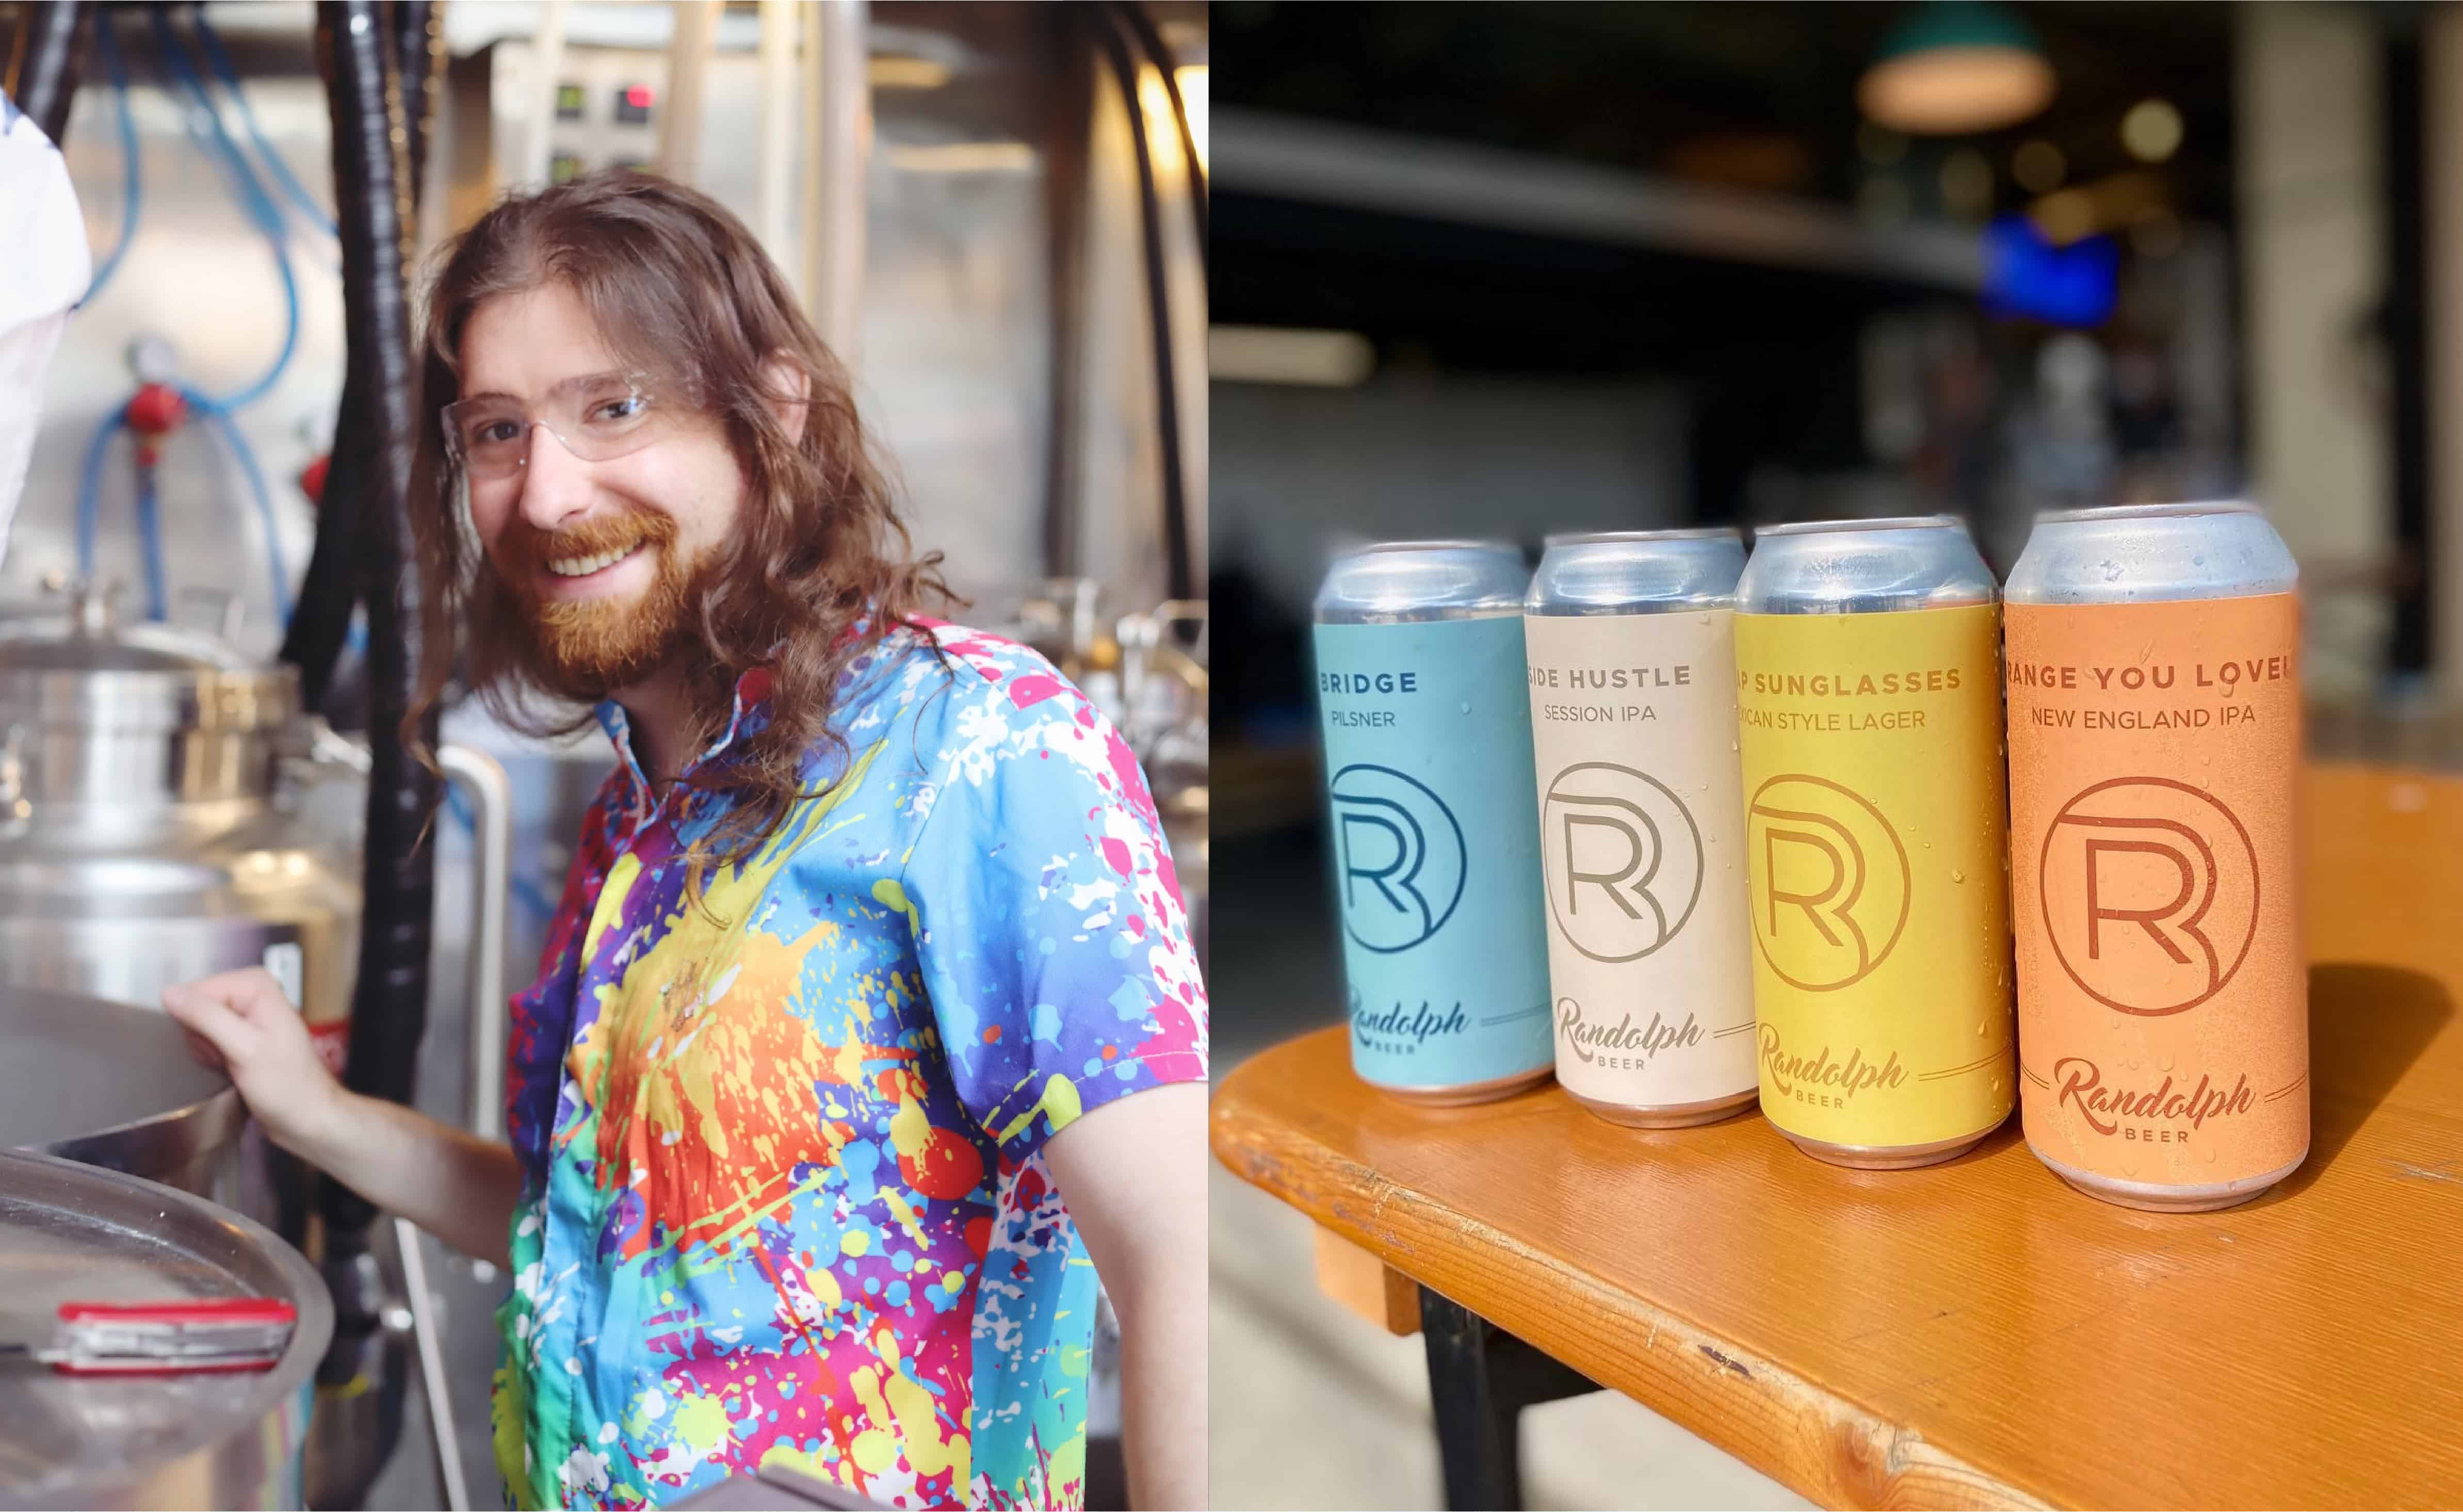 Flint Whistler_Randolph Beer